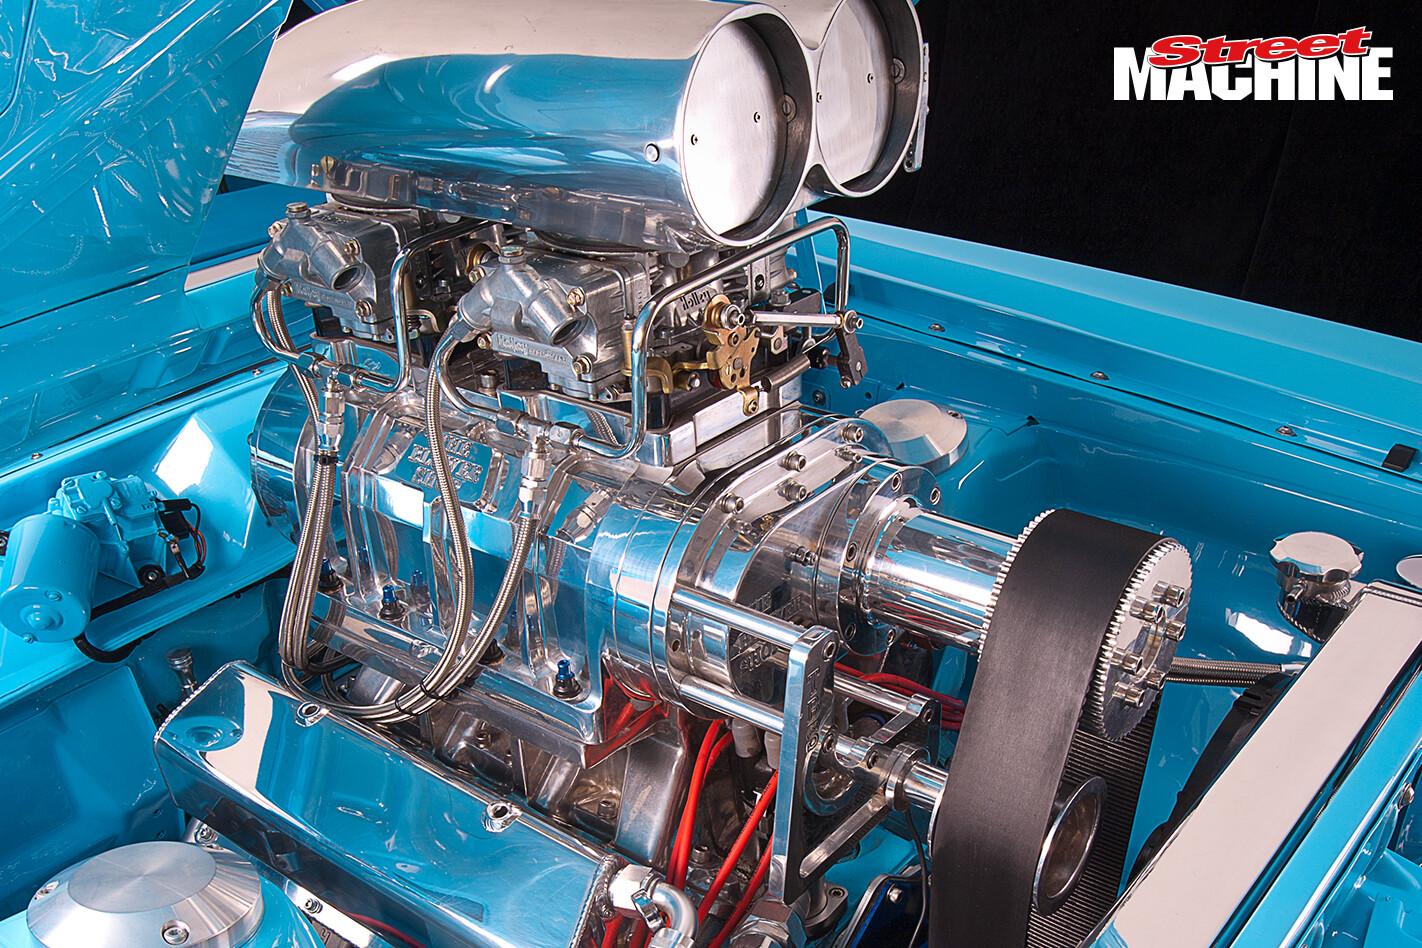 Ford XY Falcon Blown 383 Engine